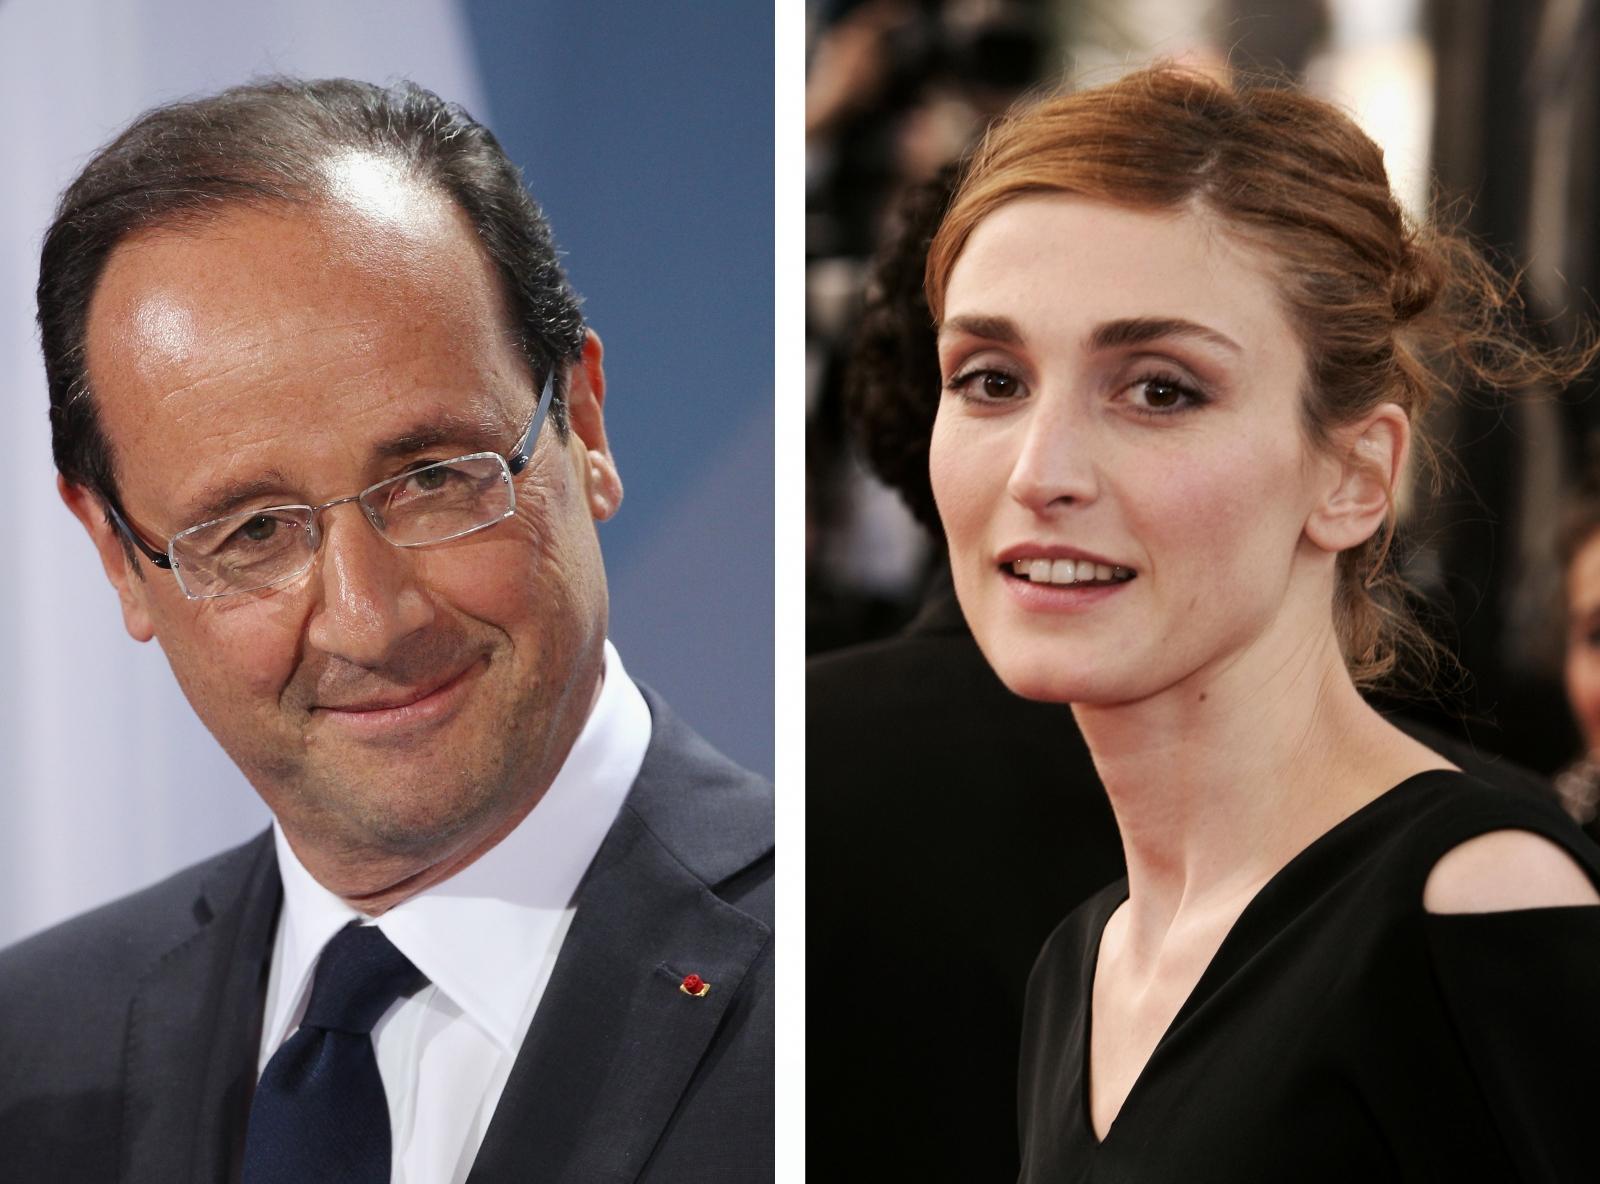 Francois Hollande Julie Gayet photos elysee palace